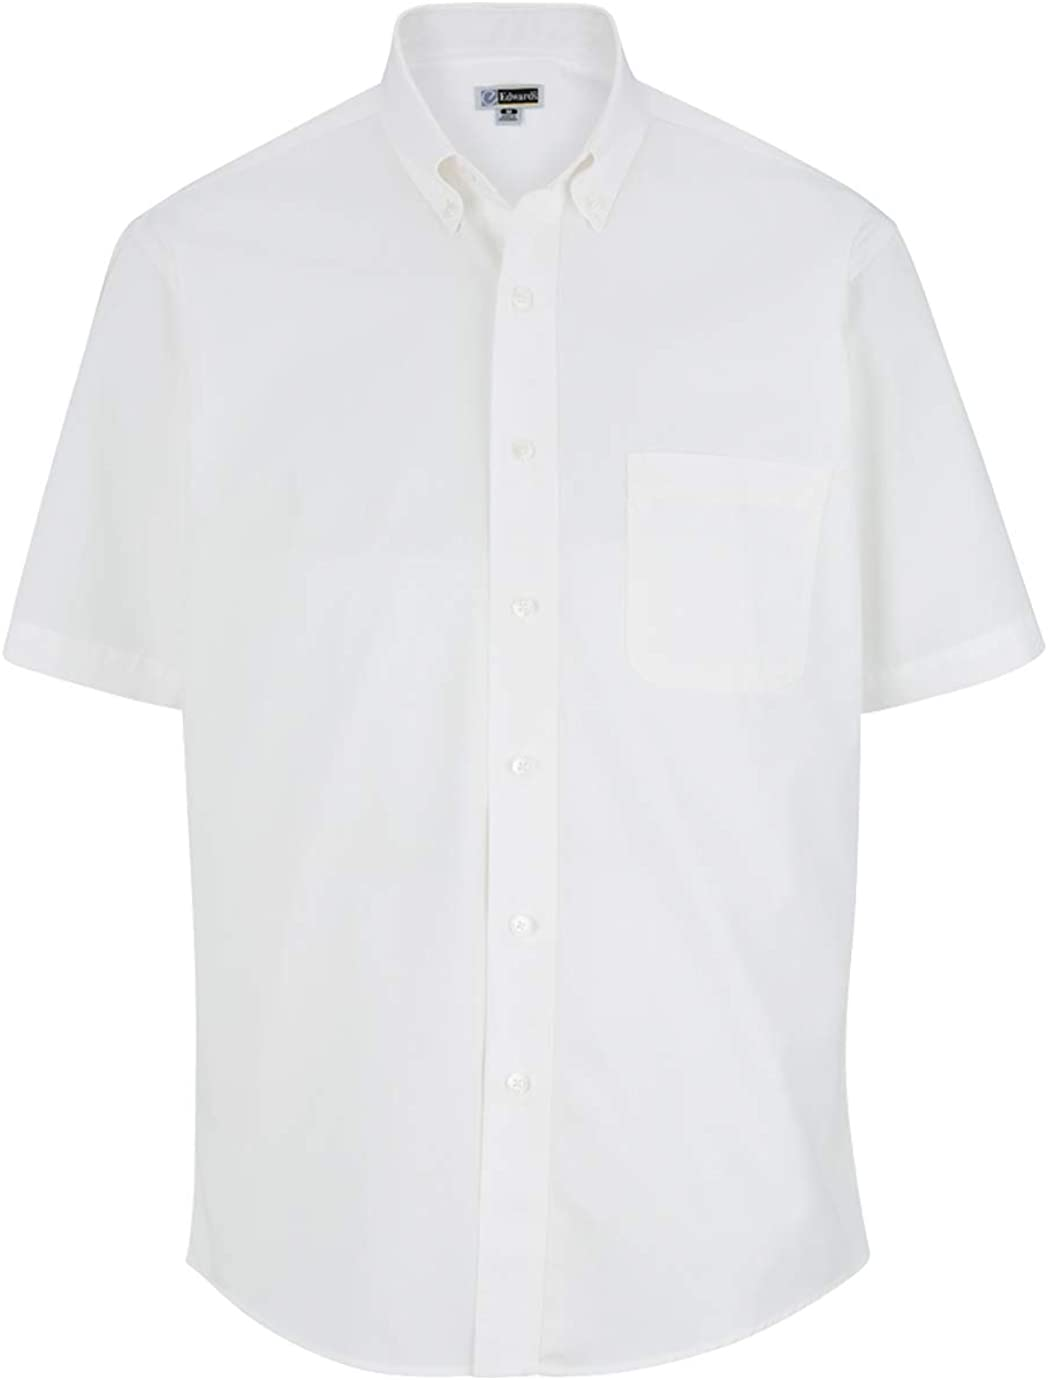 Edwards Garment Men's Casual Wrinkle Resistant Short Sleeve Poplin Shirt